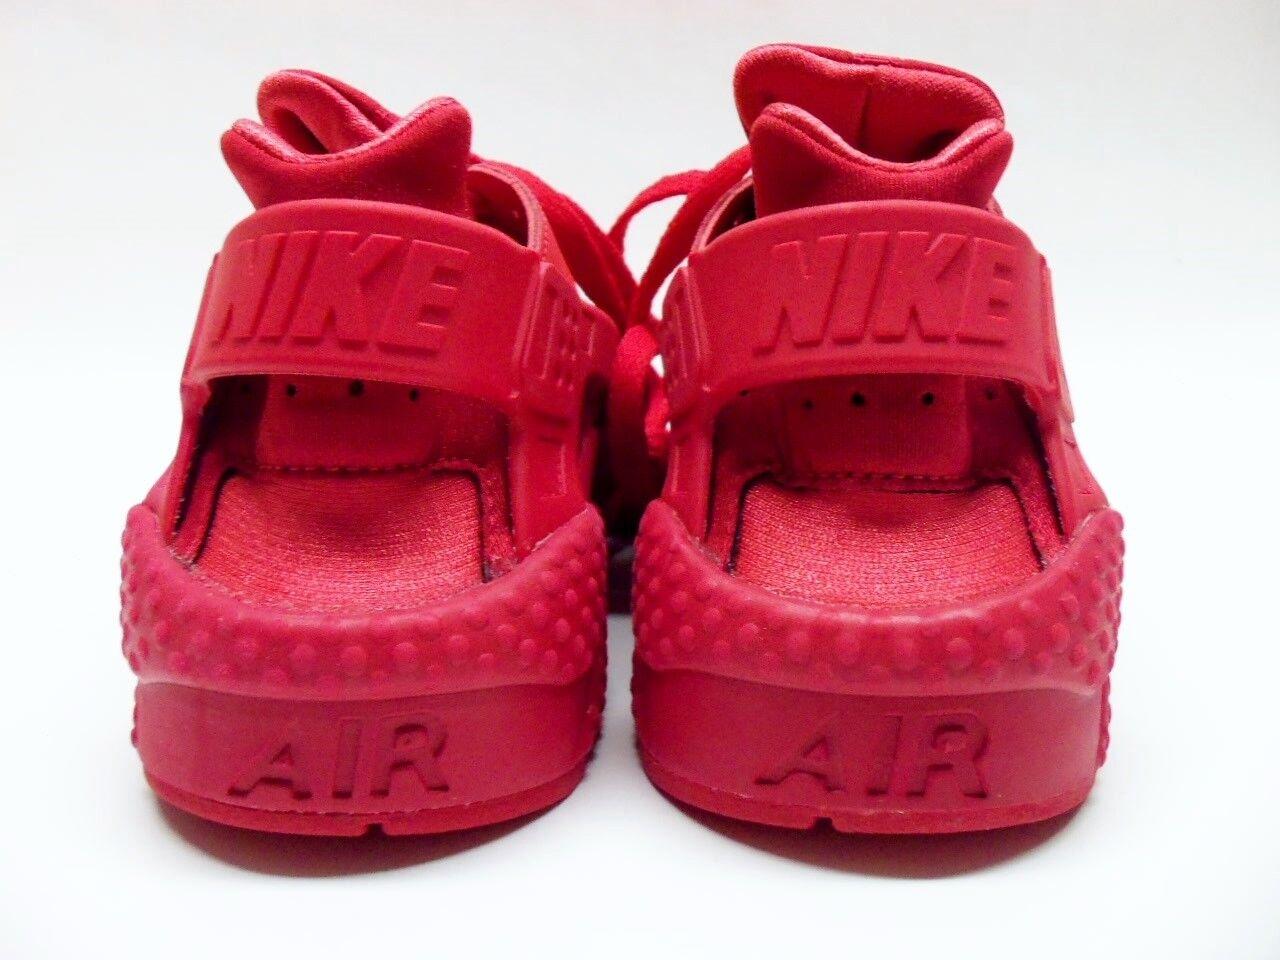 Nike air huarache ROT id trainer